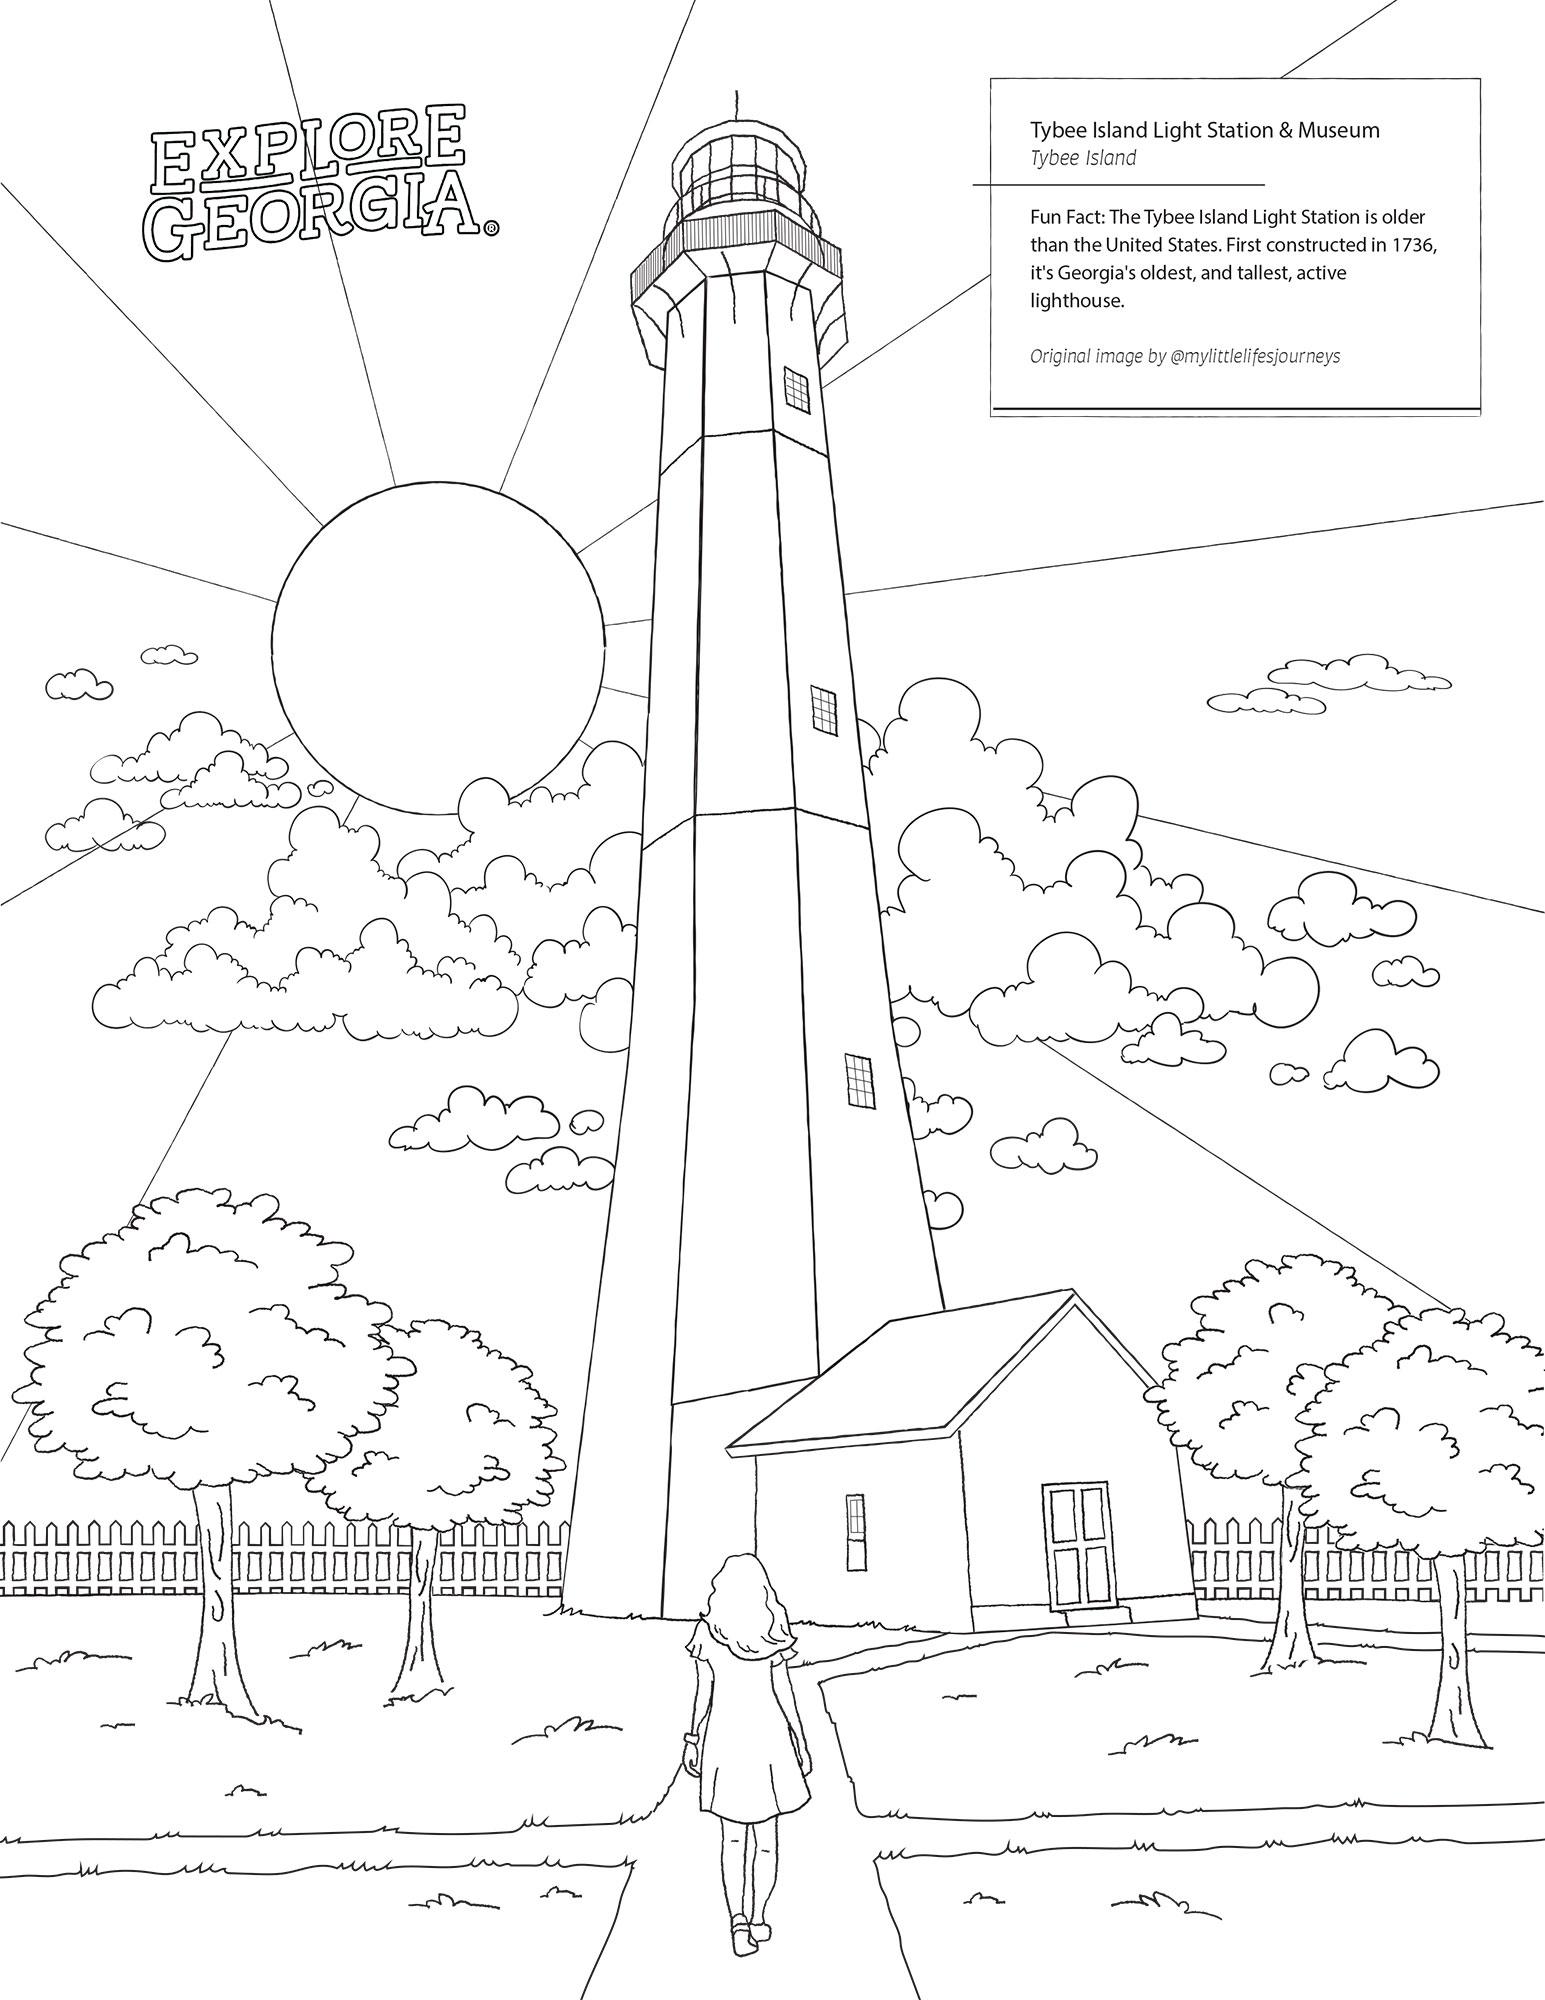 Tybee Lighthouse mural photo